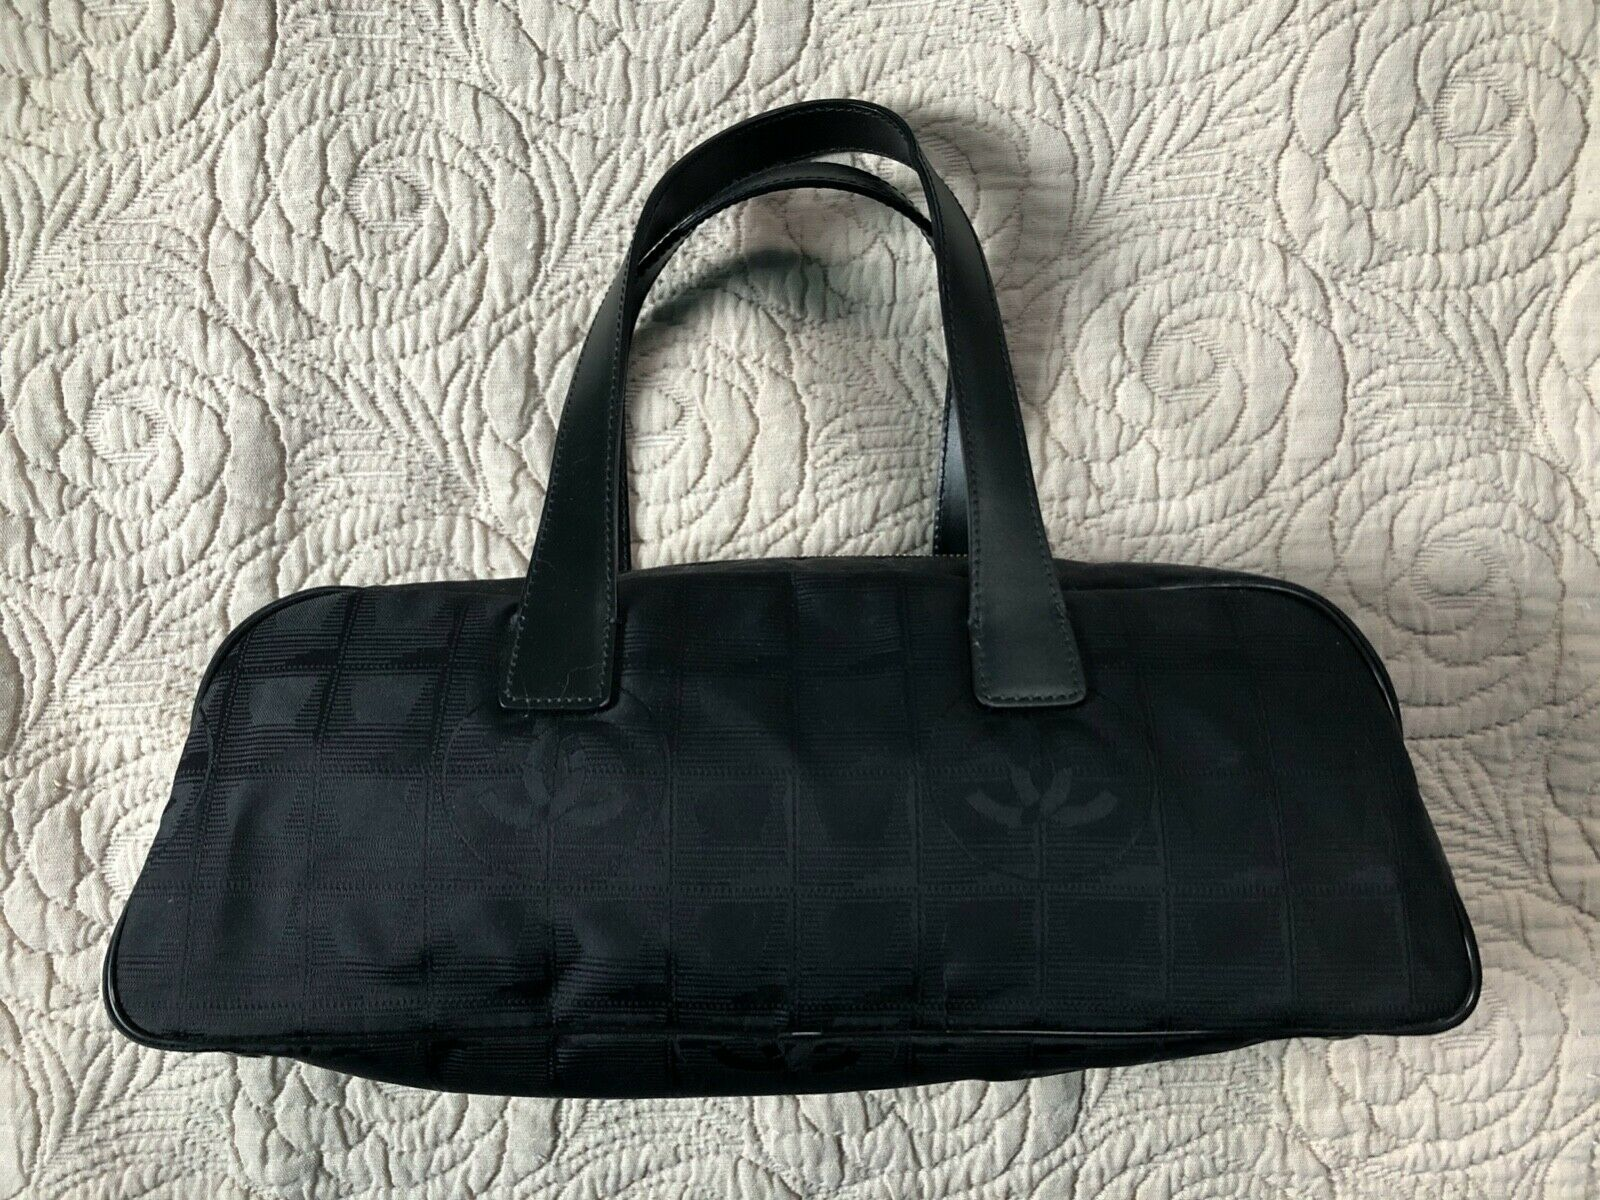 Sac à main chanel - travel line mini boston bag semi shoulder en toile